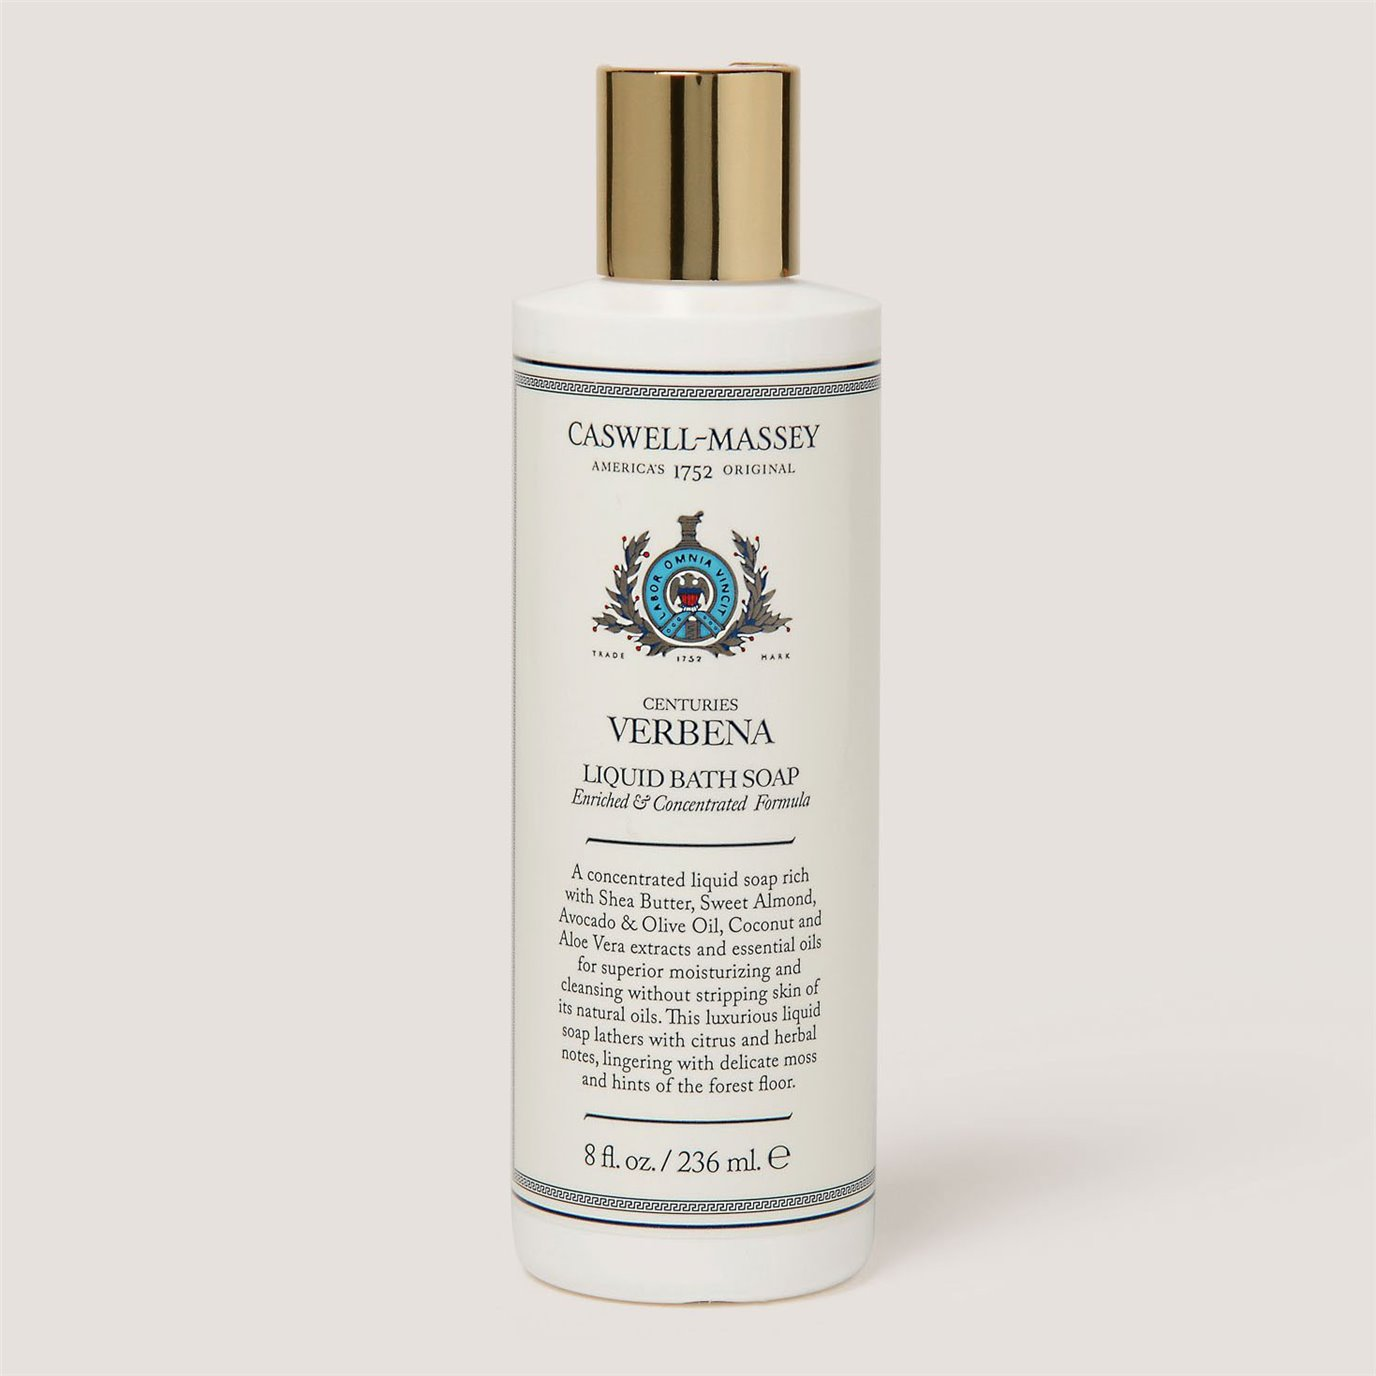 Caswell-Massey Verbena Liquid Bath Soap